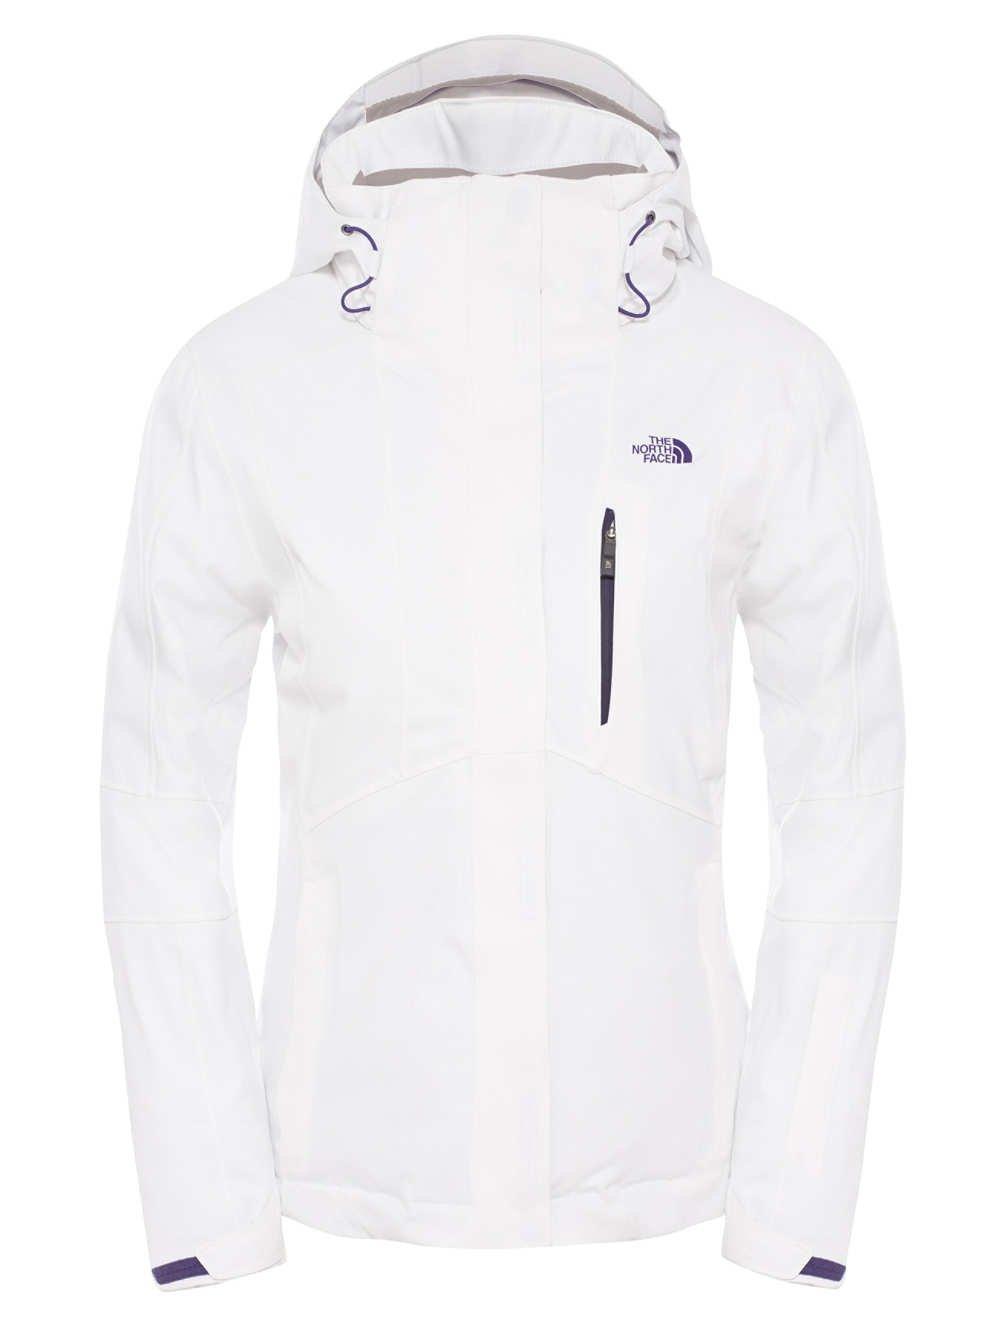 Women's Jacket White North Size Face Ravina W xs qwABztI